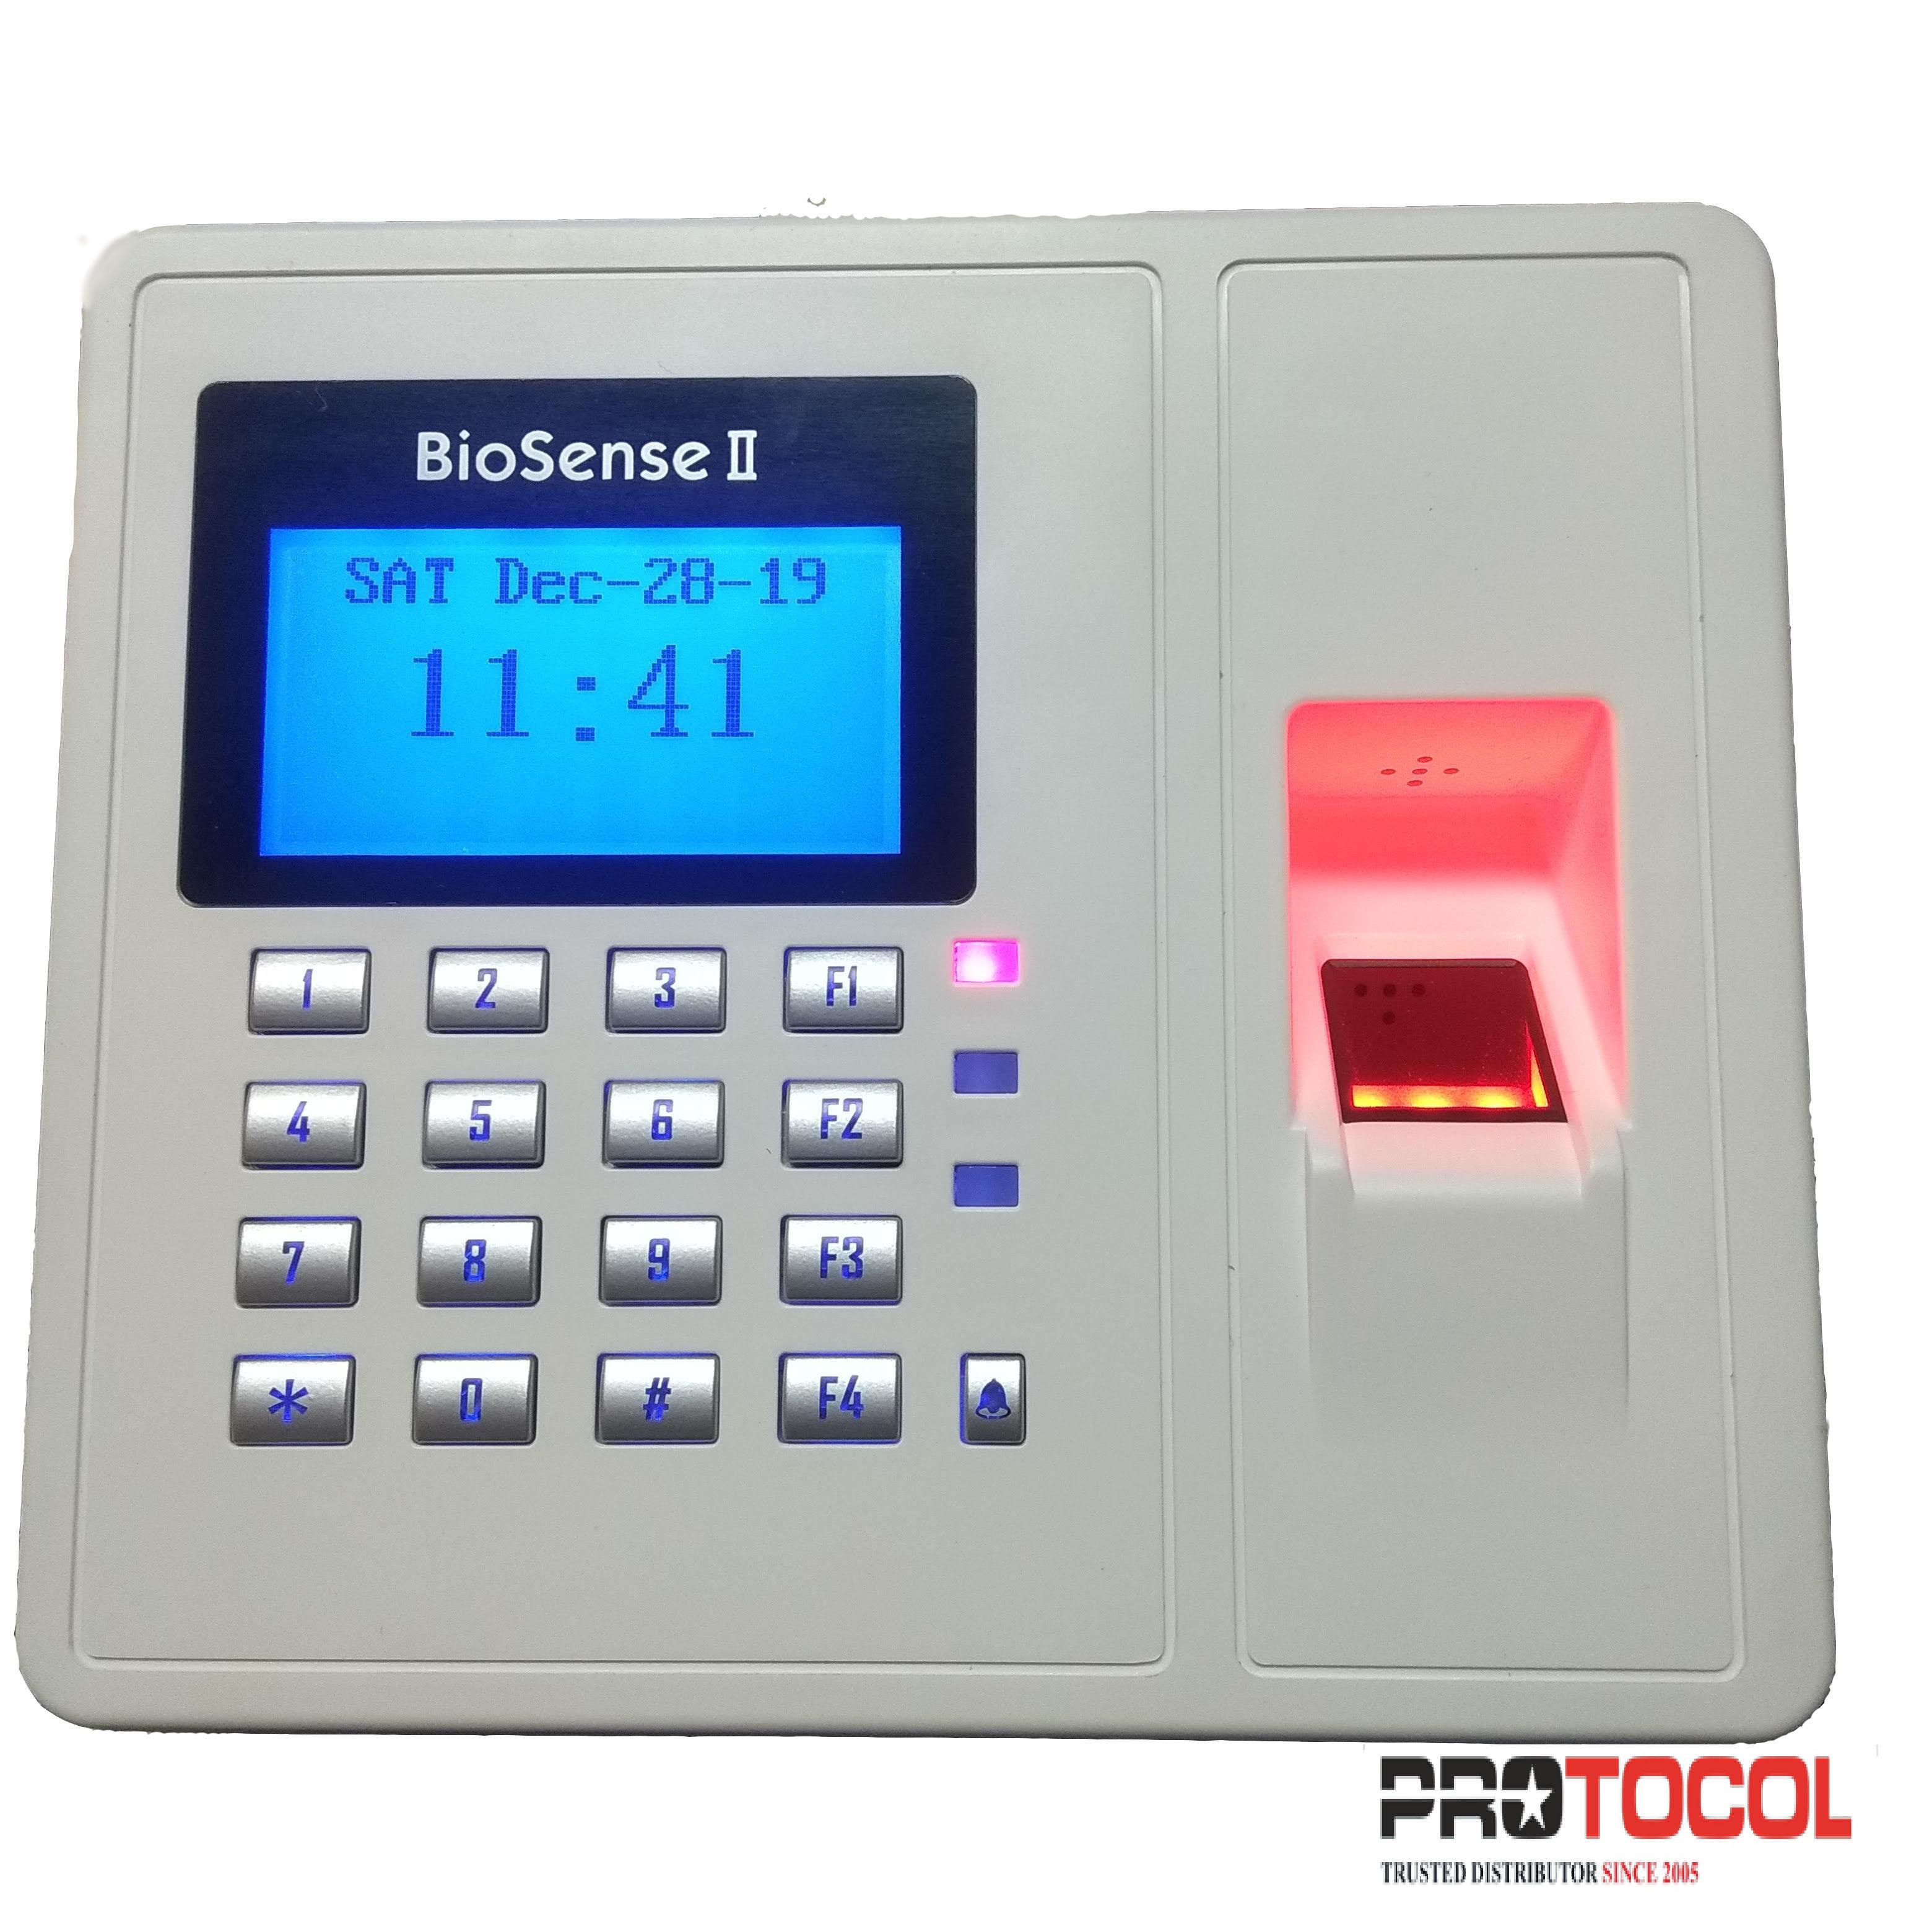 BioSense II